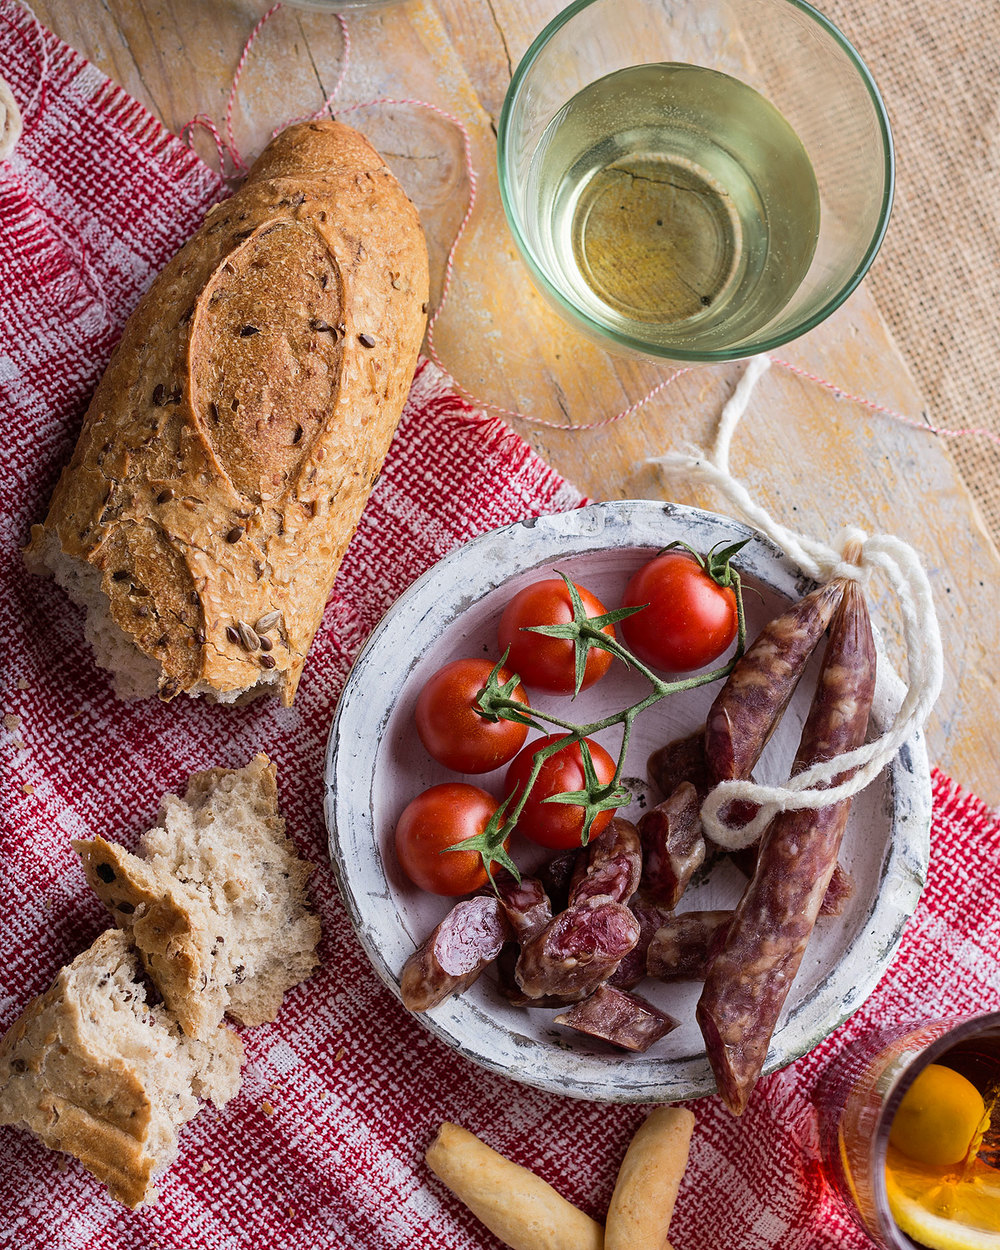 corina-landa-food-photography-fotografia-gastronomica-57.jpg